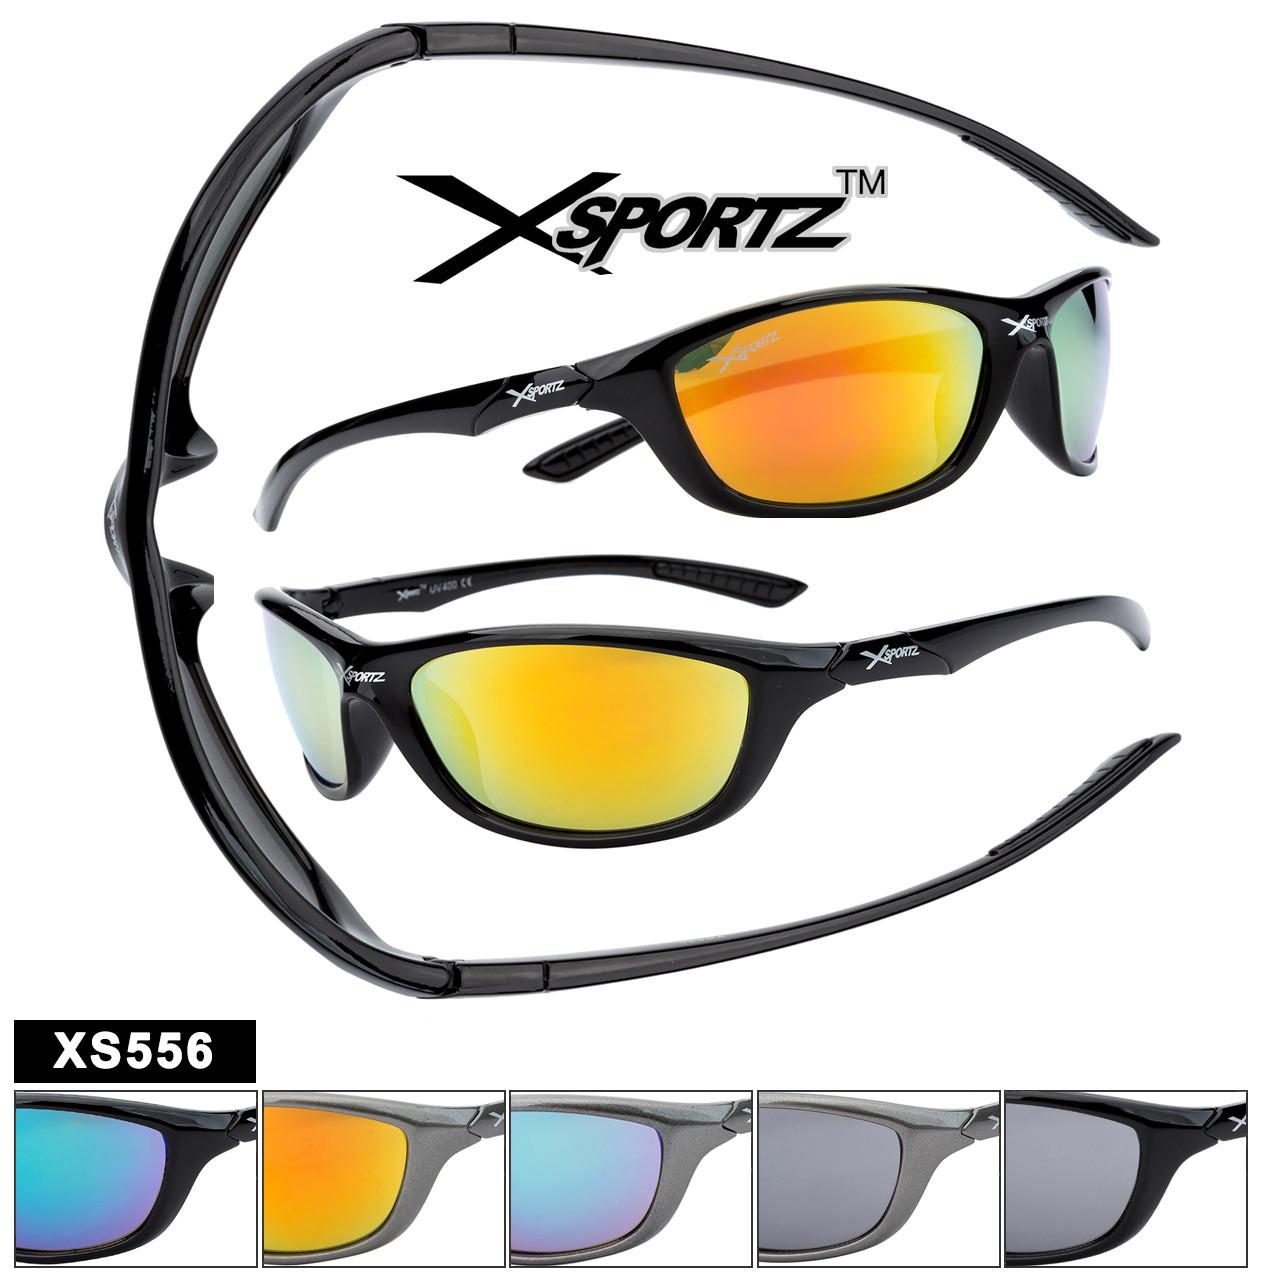 Xsportz Plastic Sports Sunglasses XS556